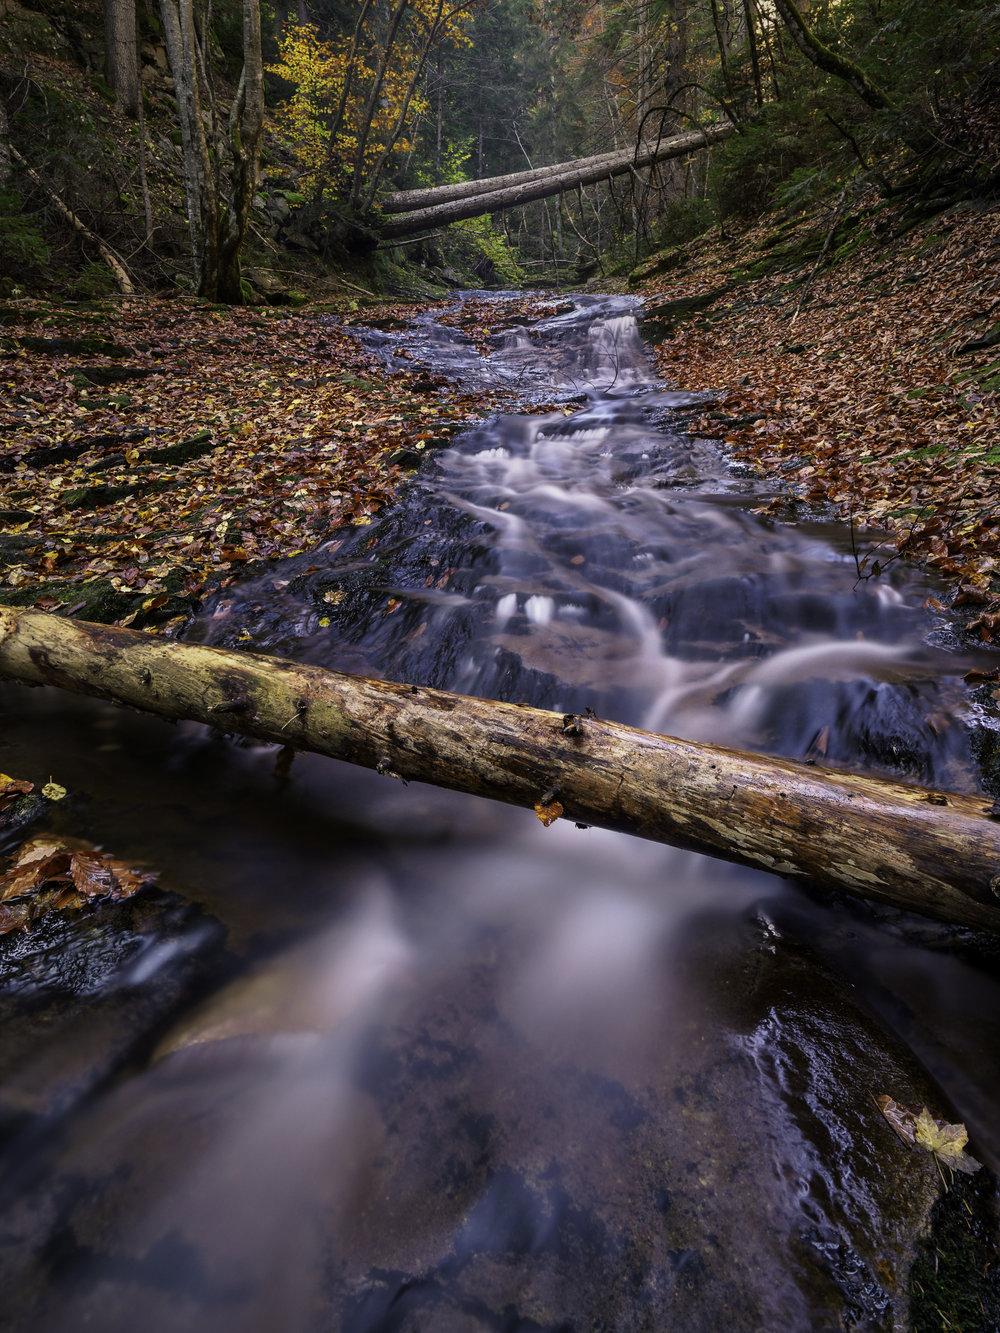 log-rhodopi-mountain-stream-fall-colours-autumn-leaves-canyonof waterfalls-colours-phototour-bulgaria-daniel-2018-portrait-Ver-2(Print).jpg